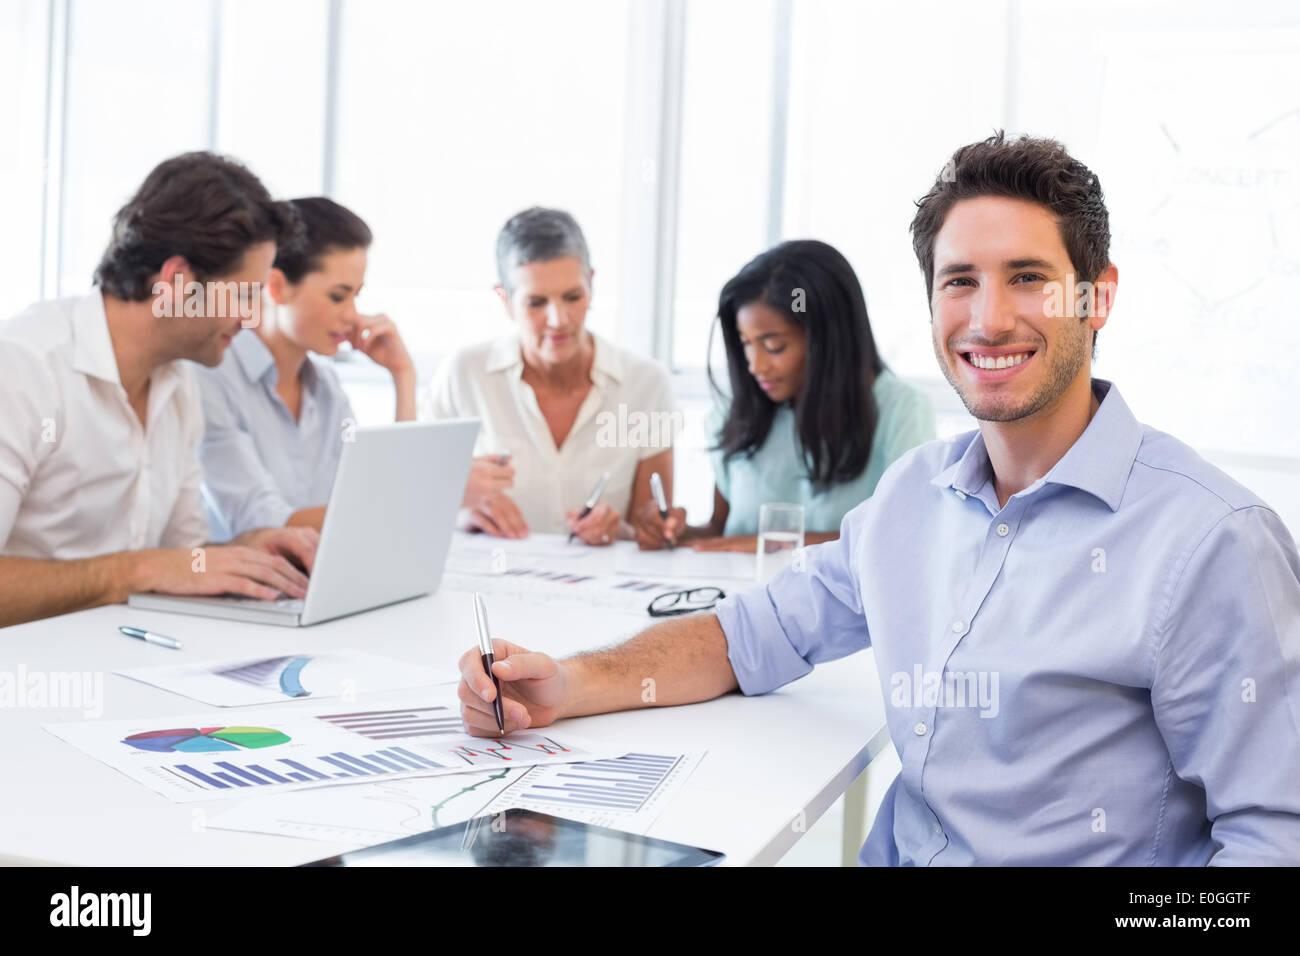 Gut aussehend Geschäftsmann lächelnd am Arbeitsplatz Stockbild